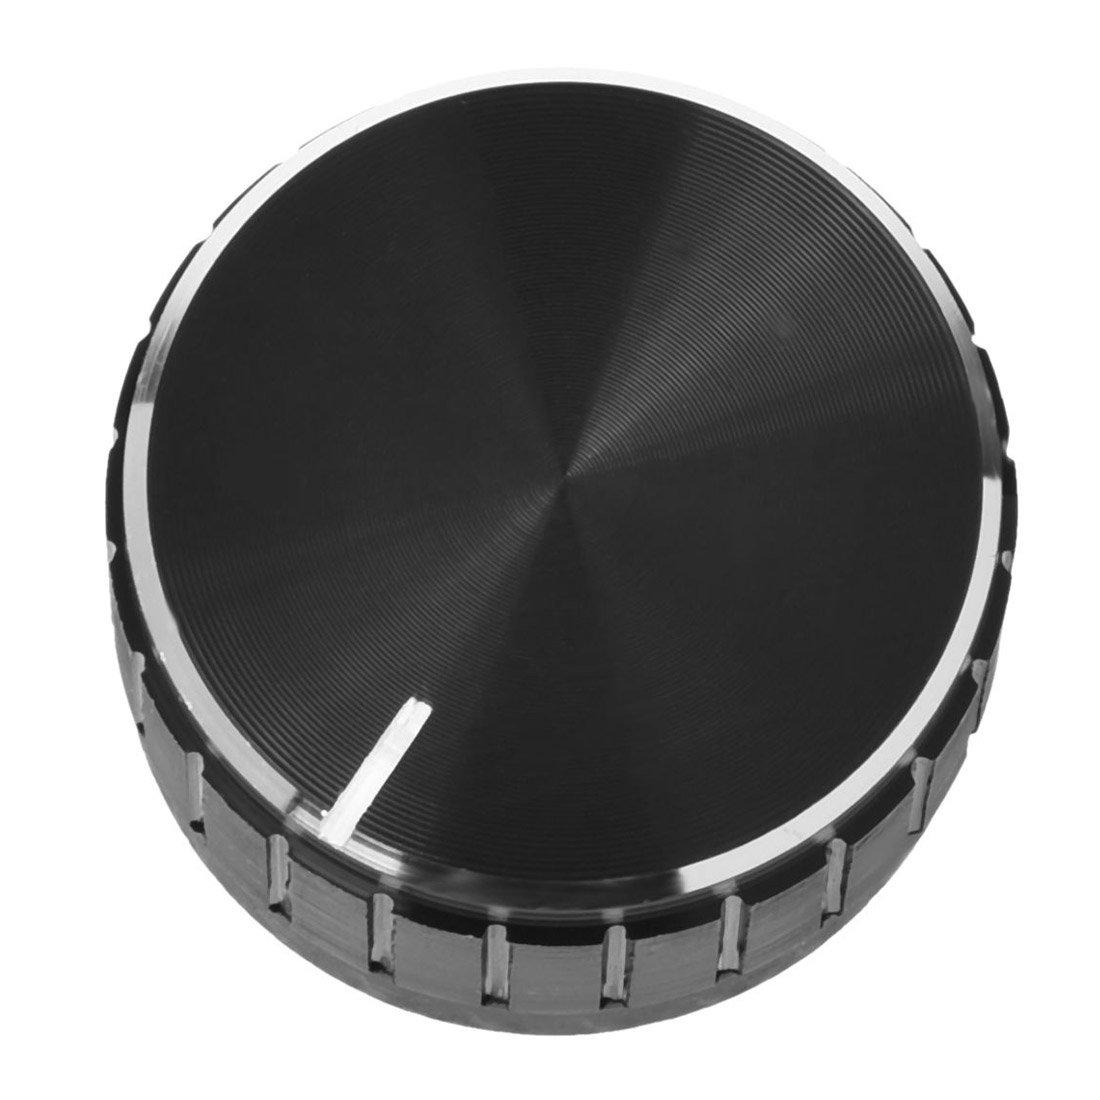 SODIAL(R) Black Aluminum Volume Control Amplifier Knob Wheel 042191